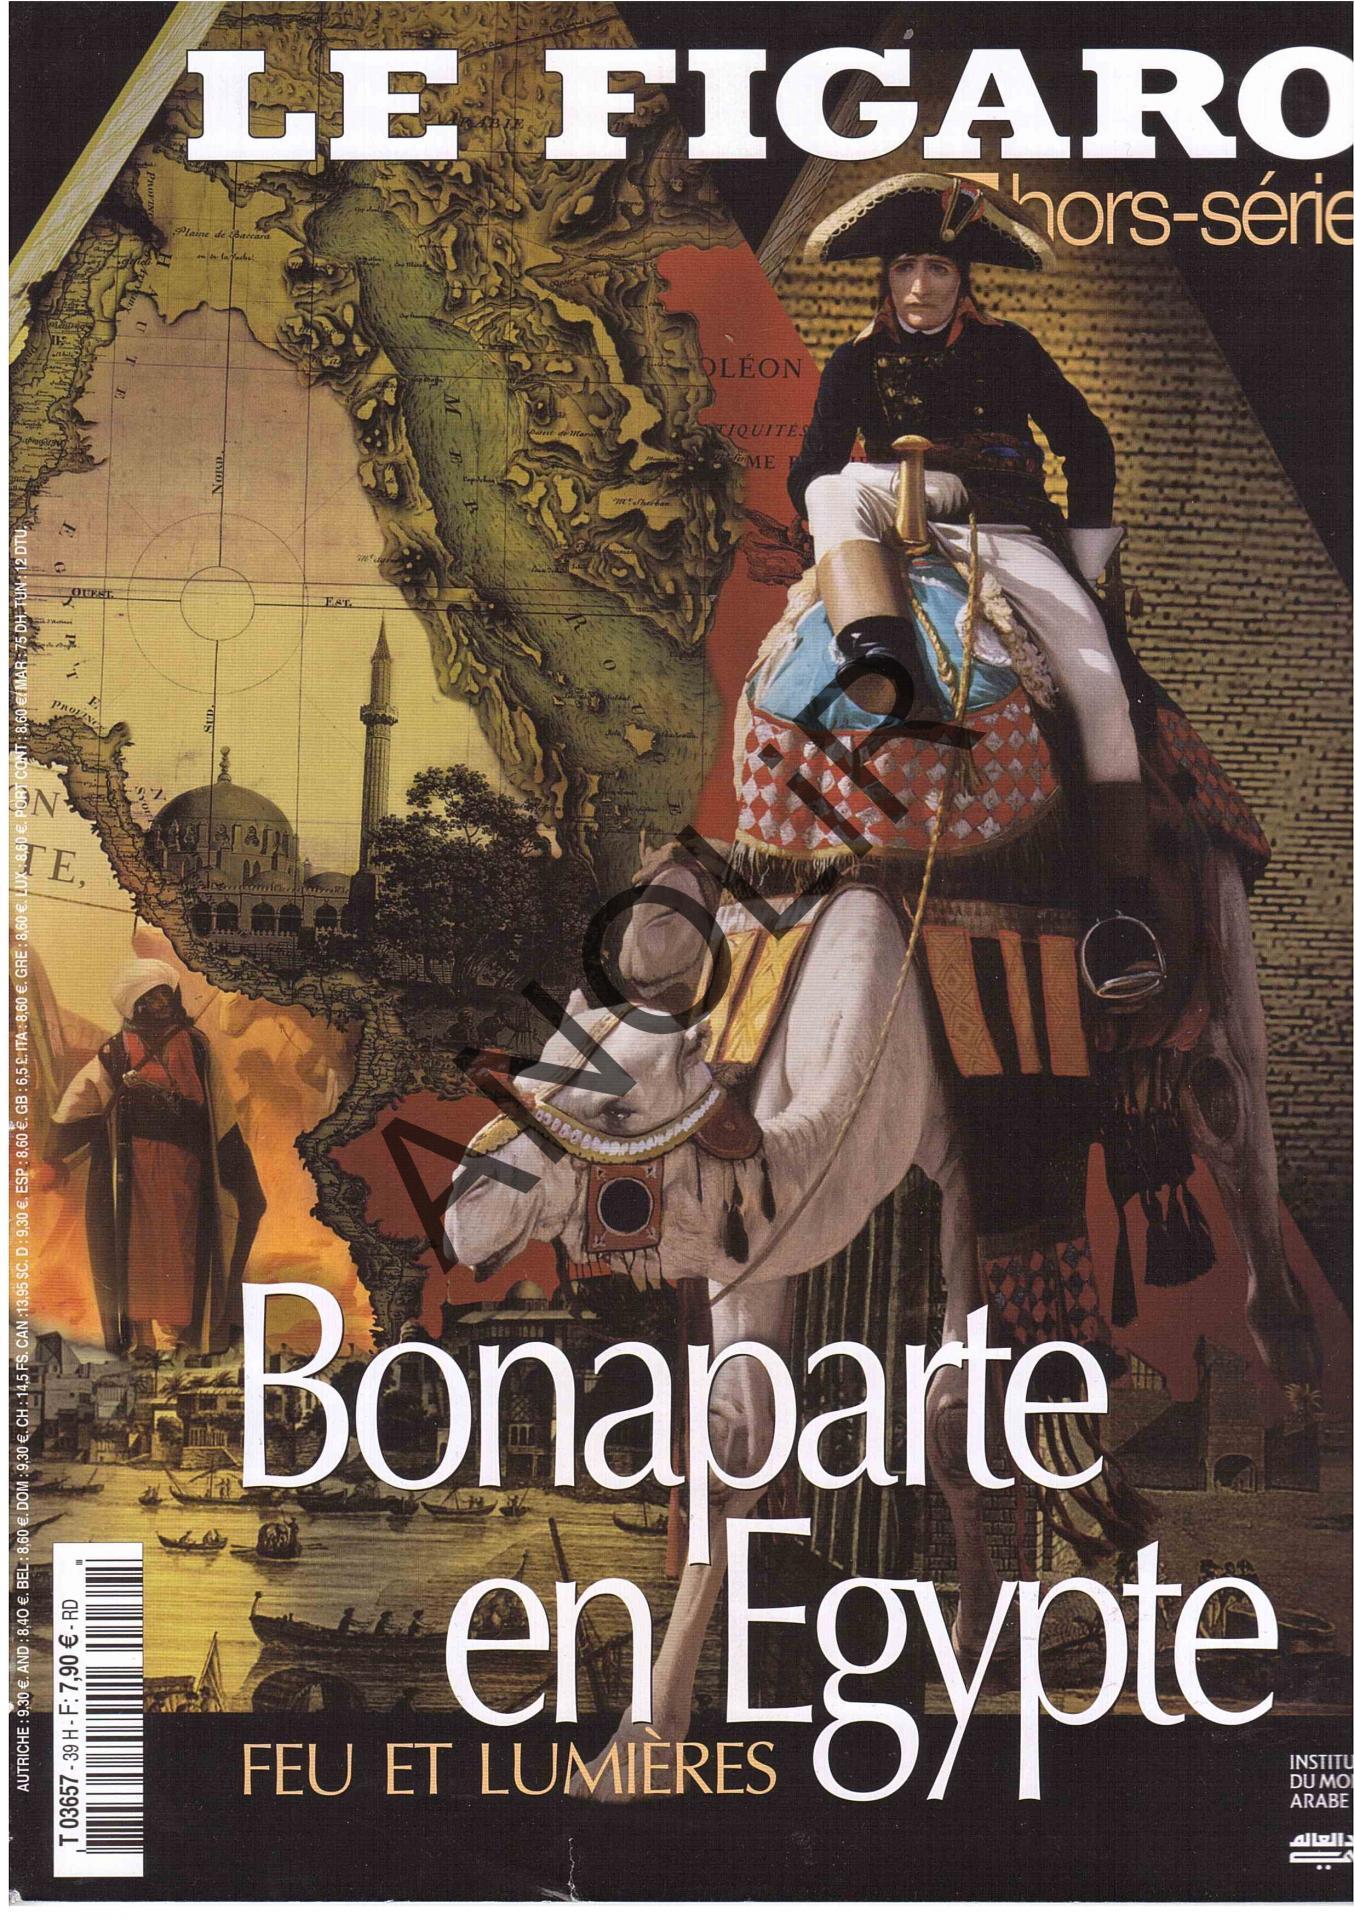 Bonaparte et l'Égypte in Le Figaro/IMA.